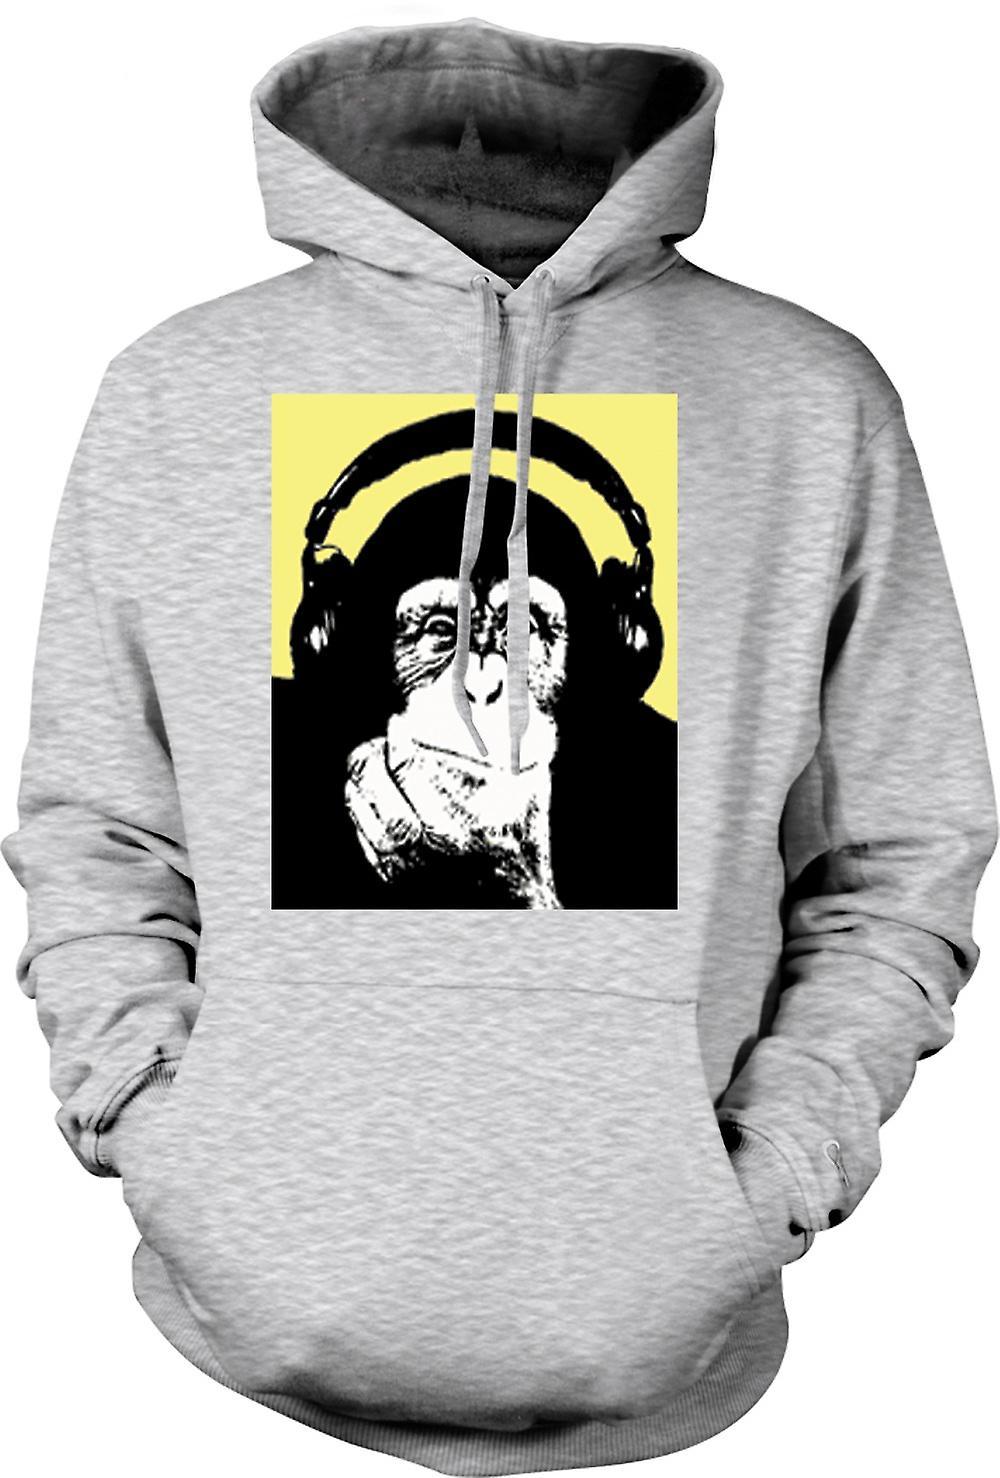 Mens Hoodie - Chimpanzee Ape DJ With Headset